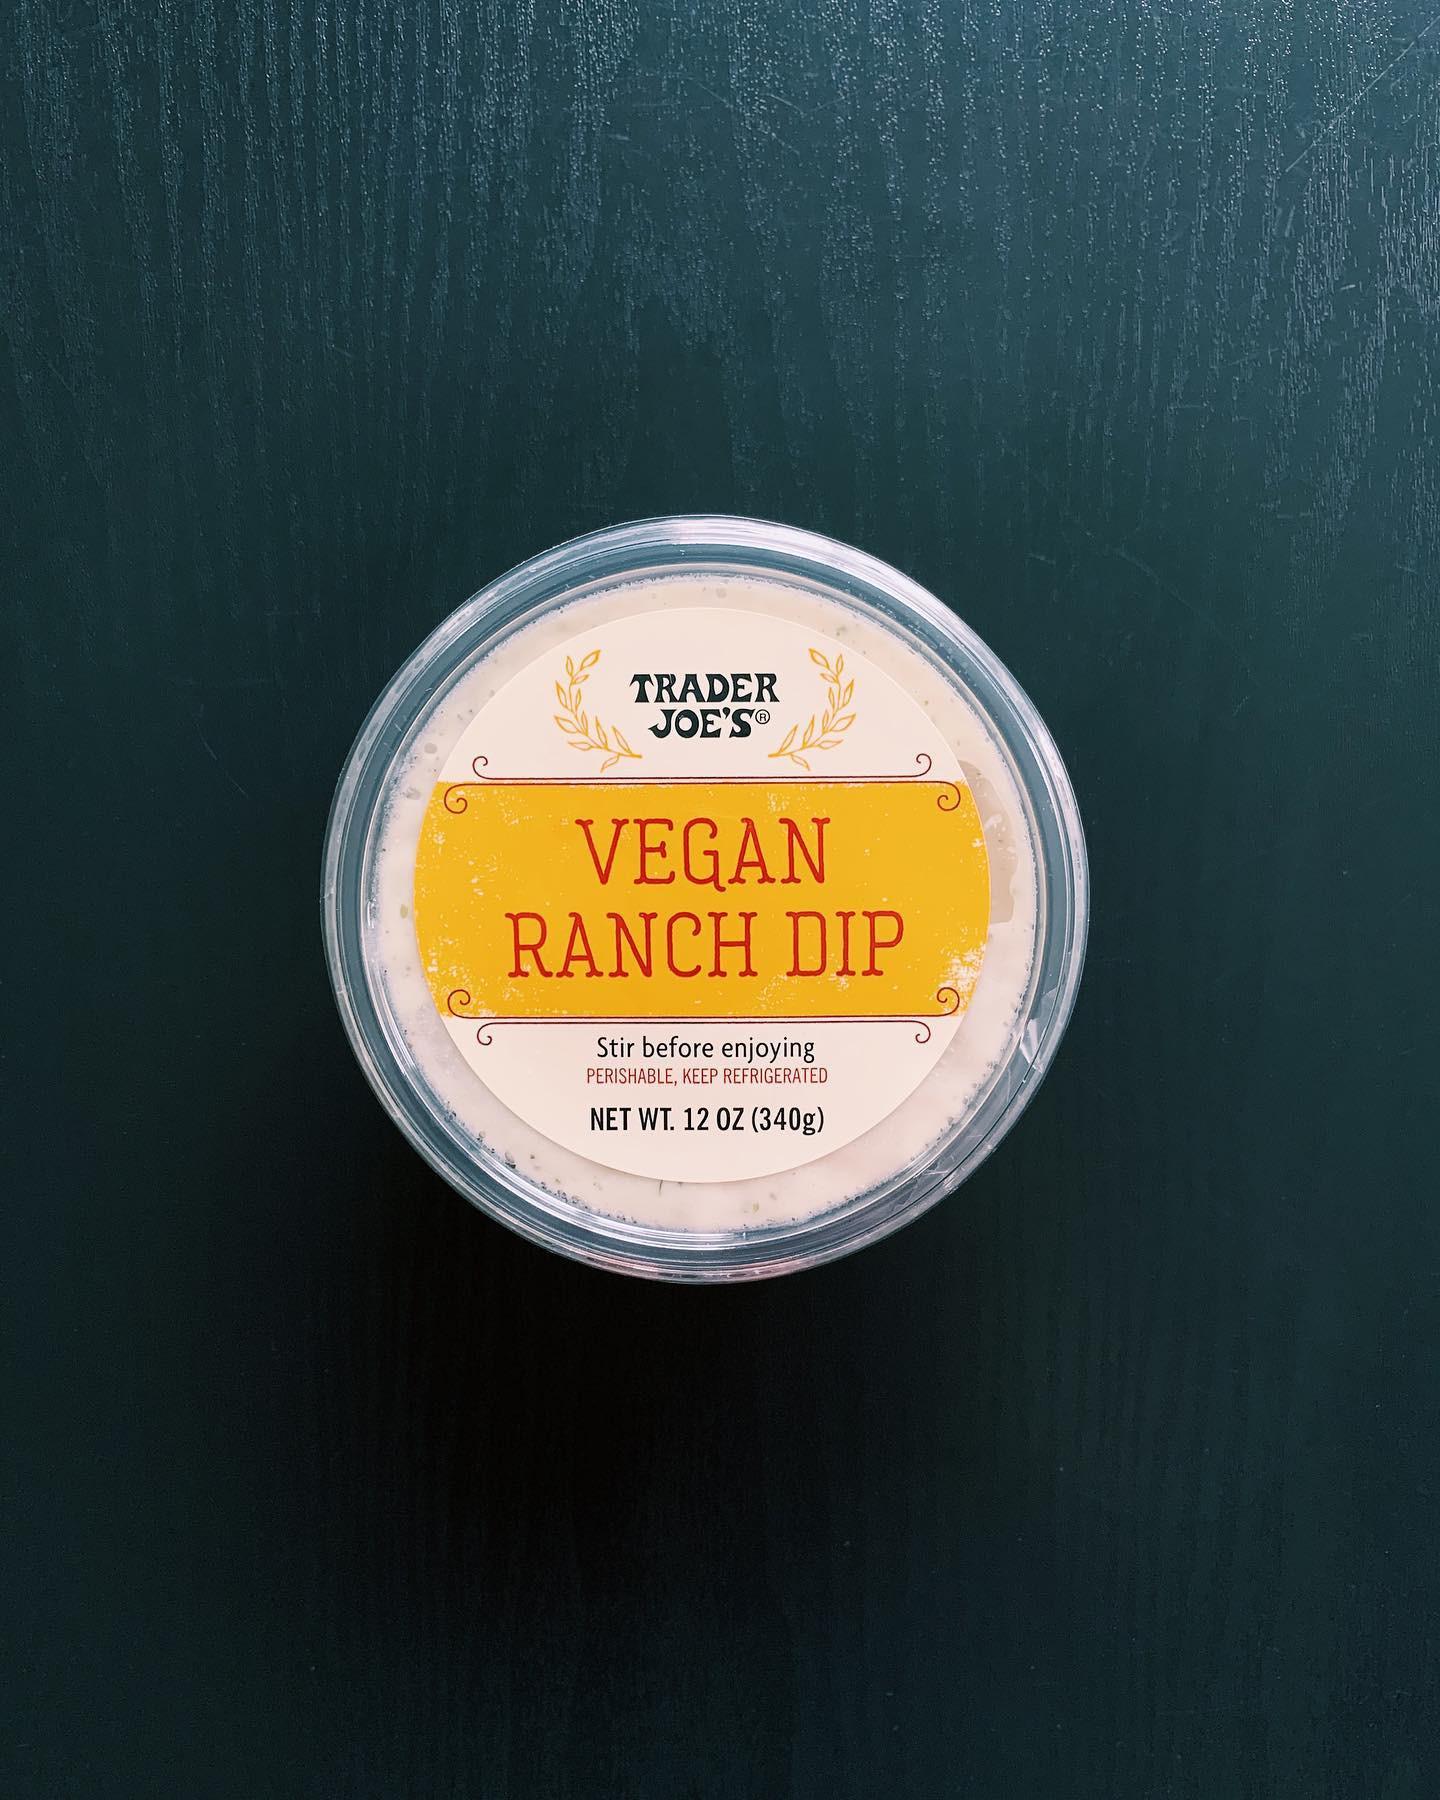 Vegan Ranch Dip: 4/10